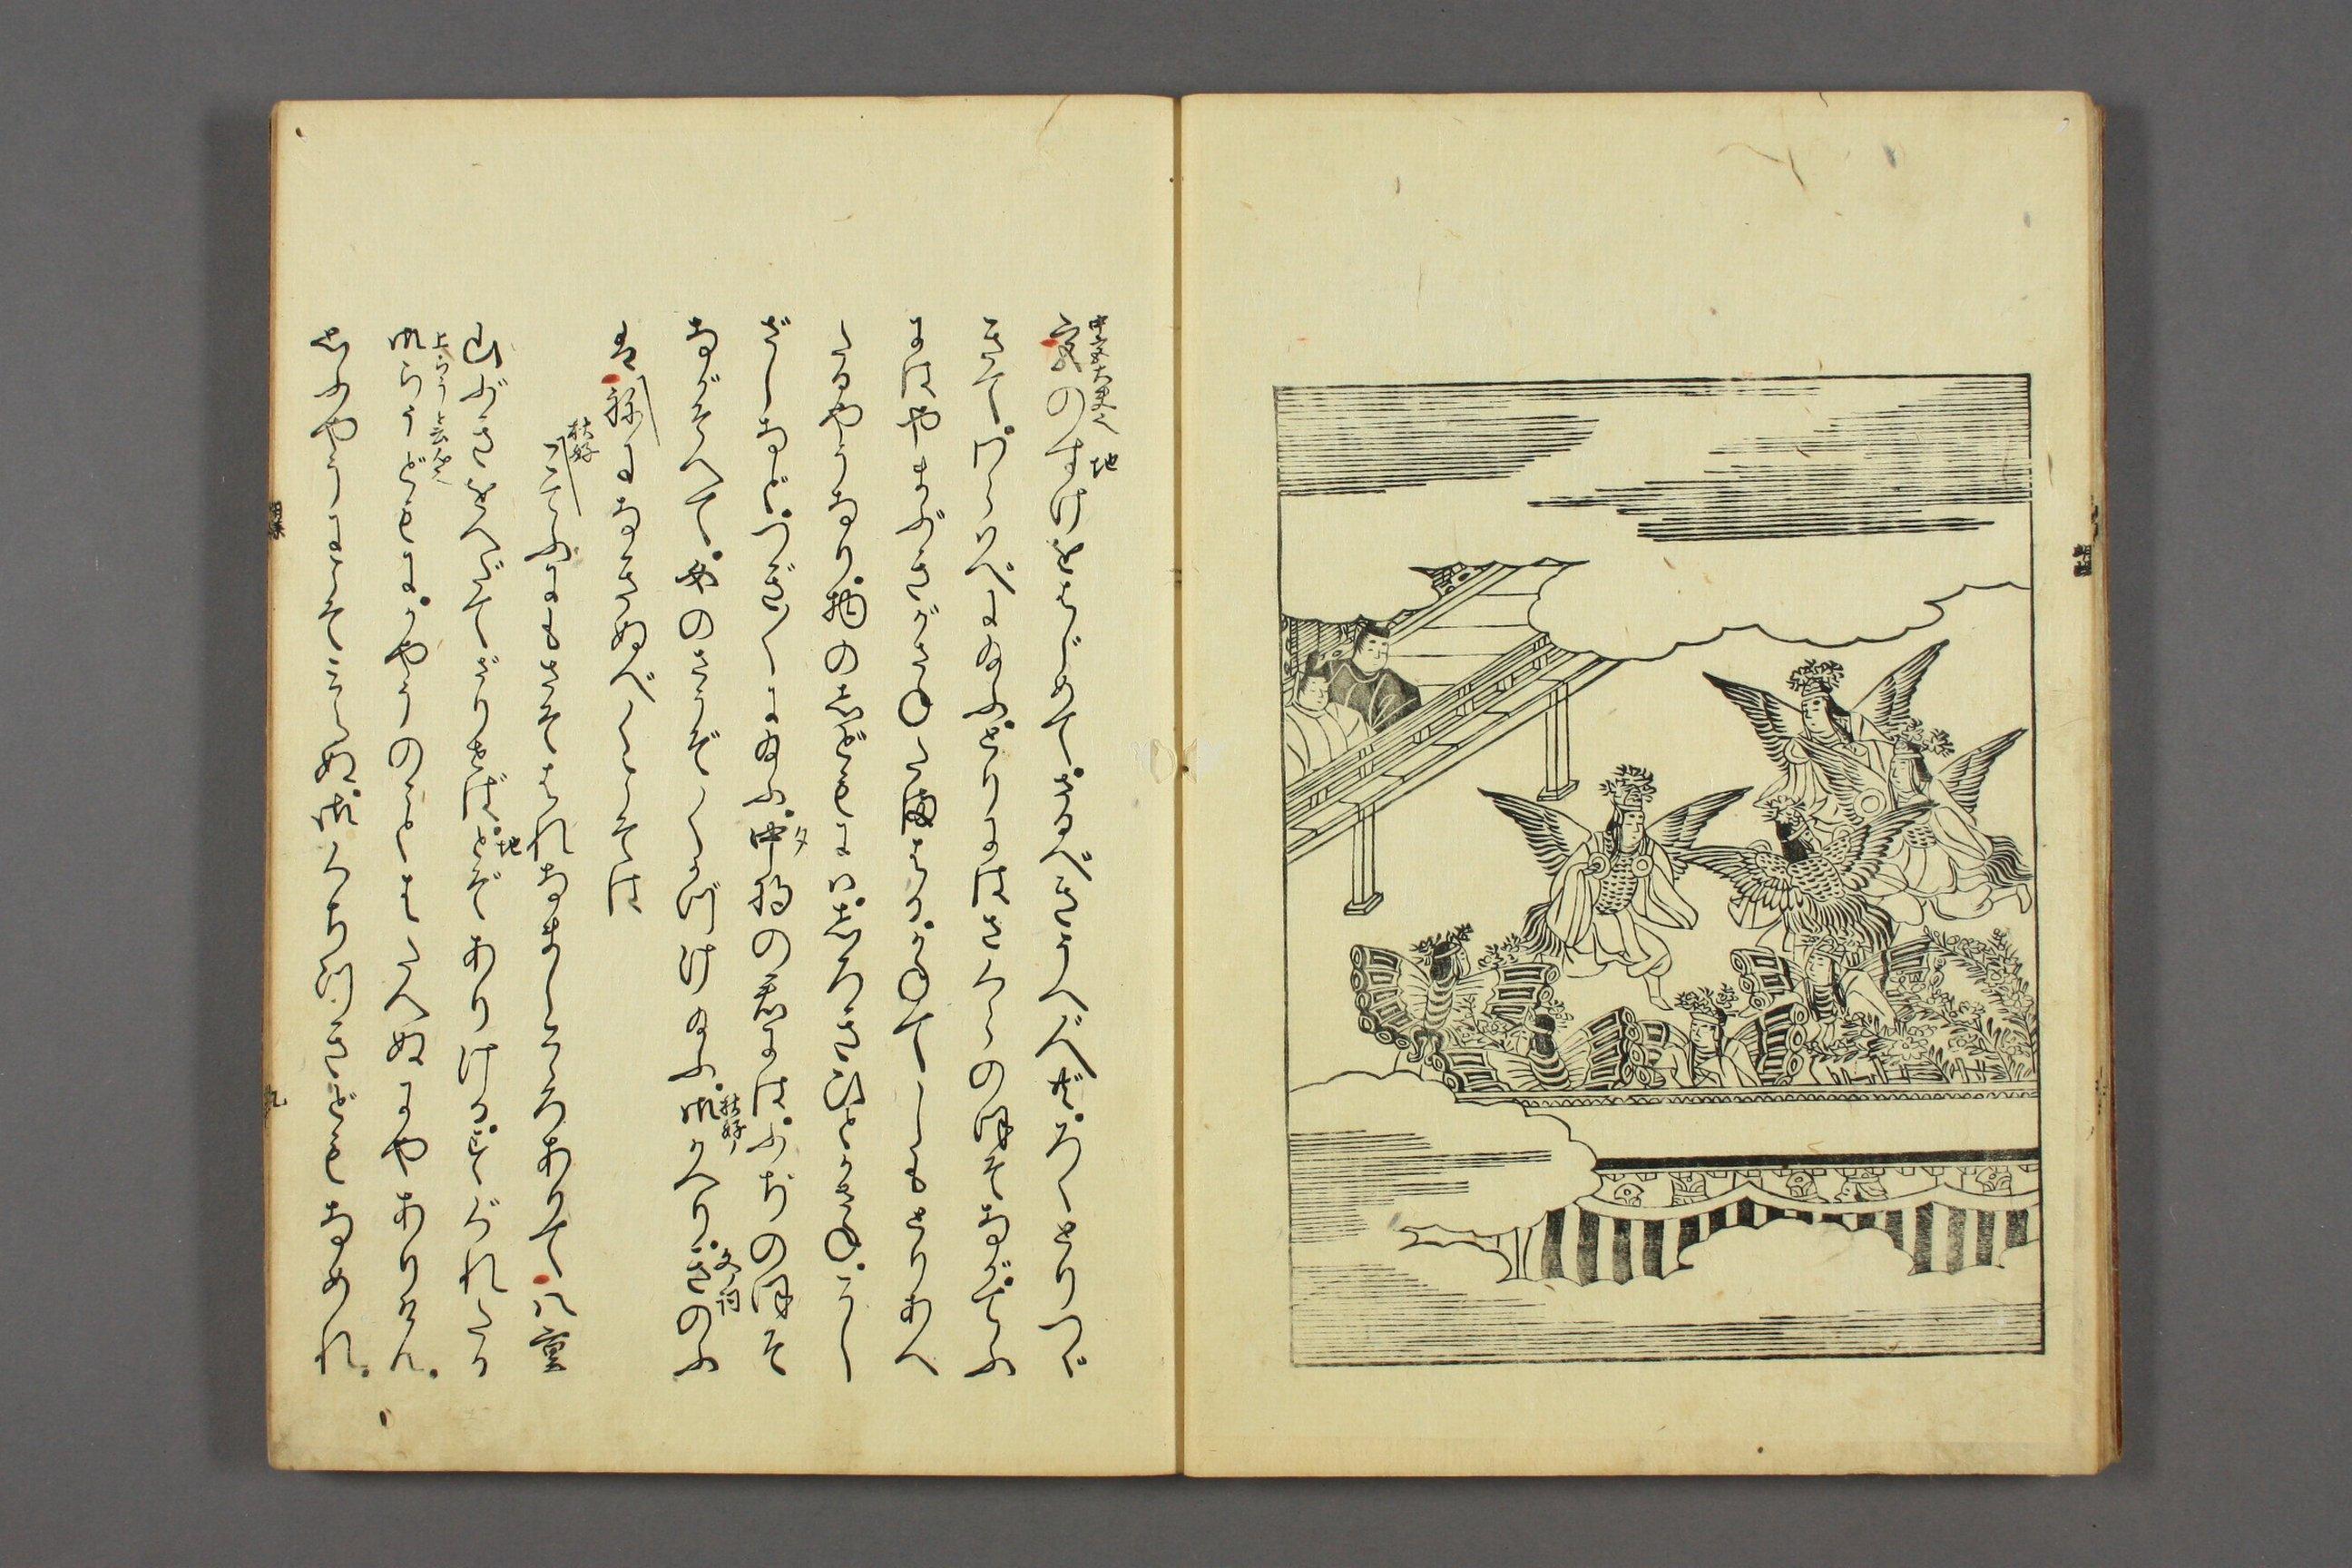 http://archive.wul.waseda.ac.jp/kosho/bunko30/bunko30_a0007/bunko30_a0007_0024/bunko30_a0007_0024_p0010.jpg